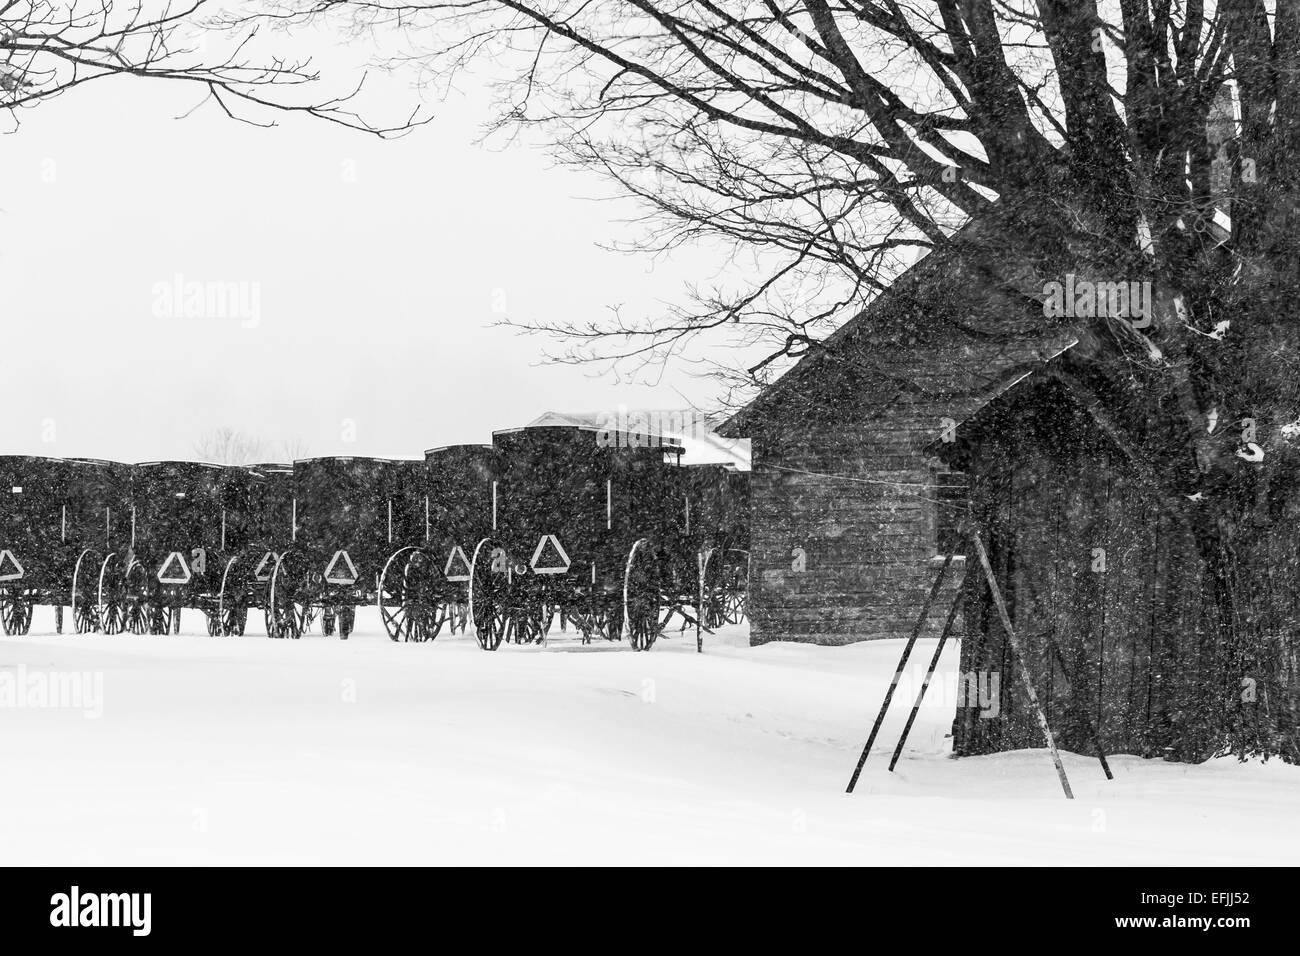 Amish Black And White Stock Photos Amp Images Alamy